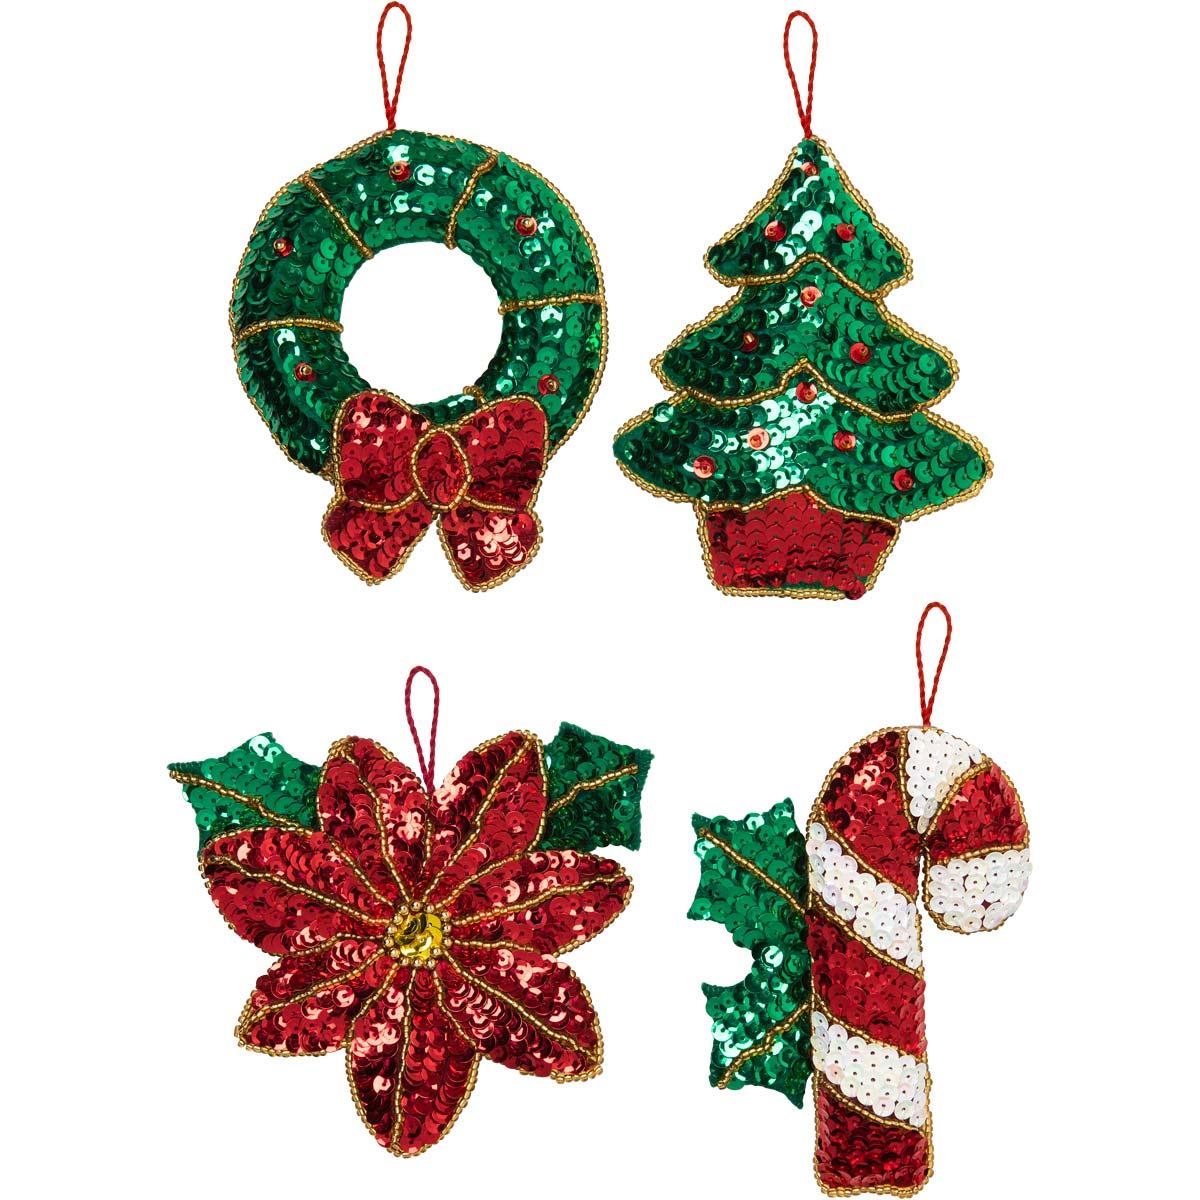 Bucilla ® Seasonal - Felt - Ornament Kits - Glitzy Poinsettia - 89216E